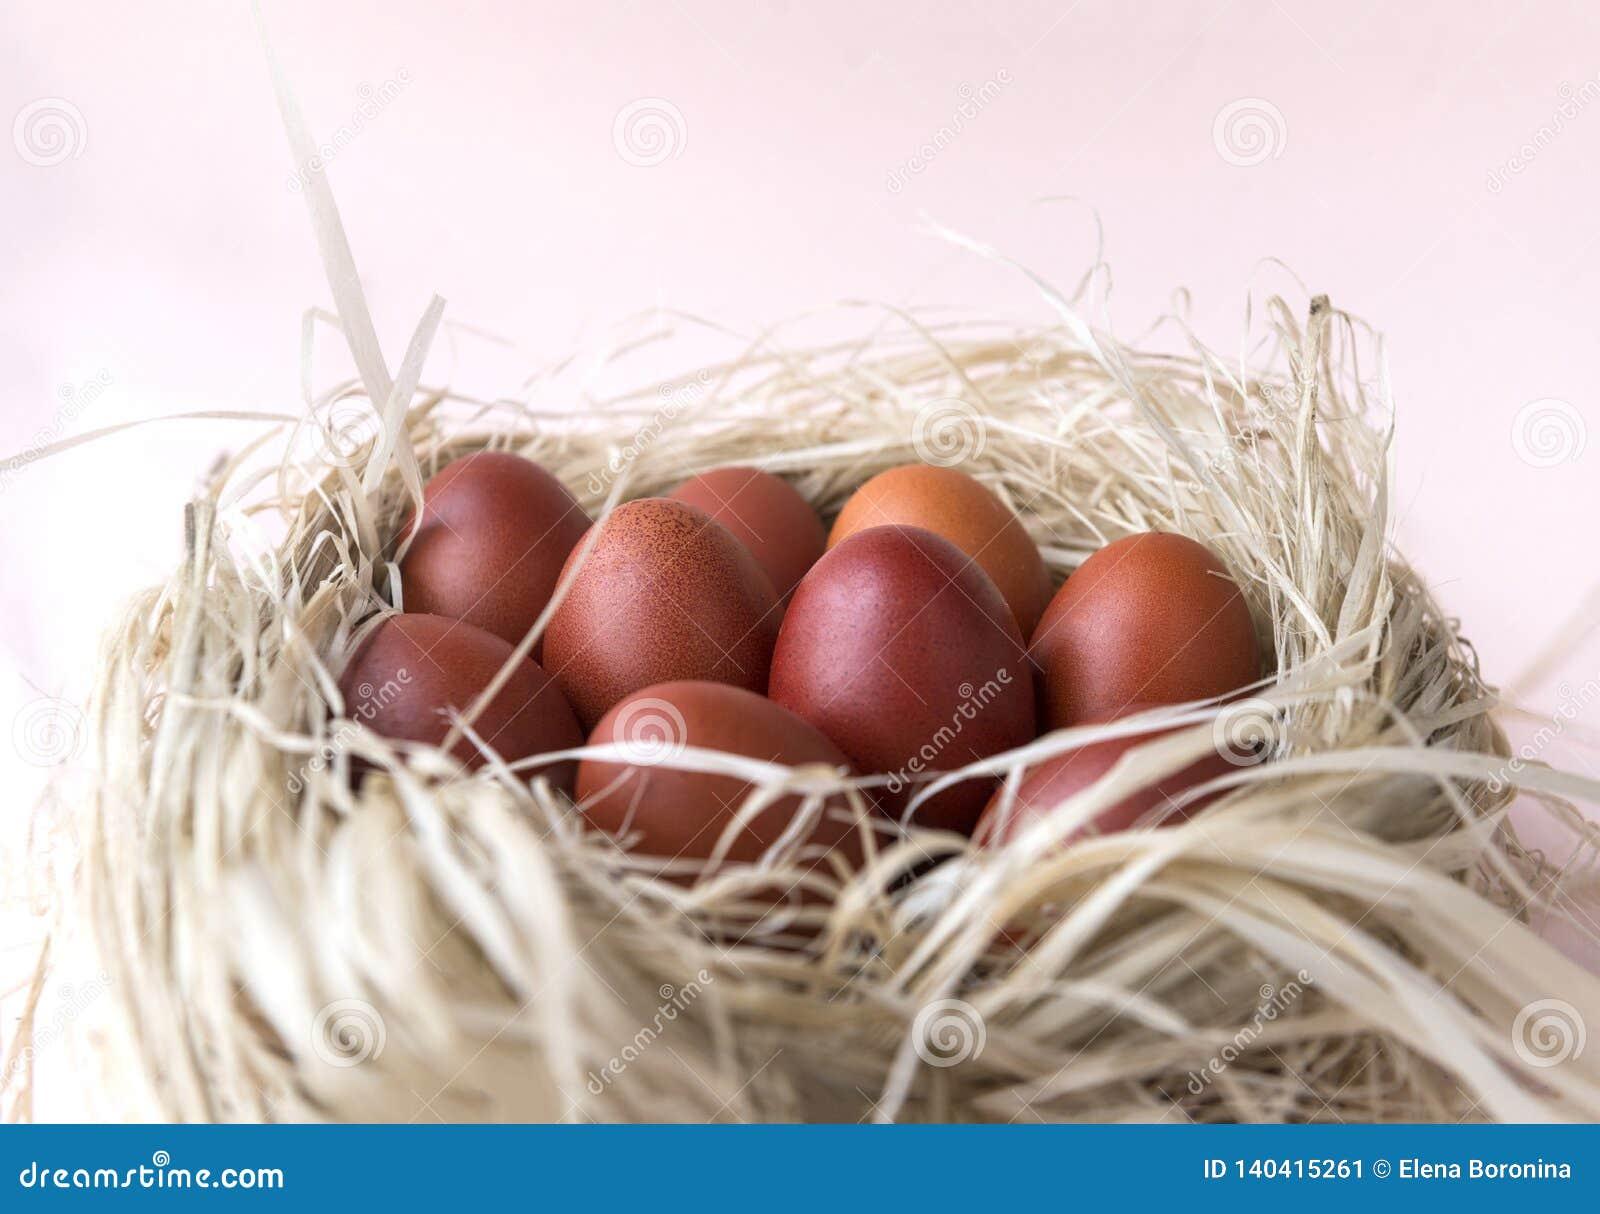 Few brown eggs in the nest, Easter, boiled eggs